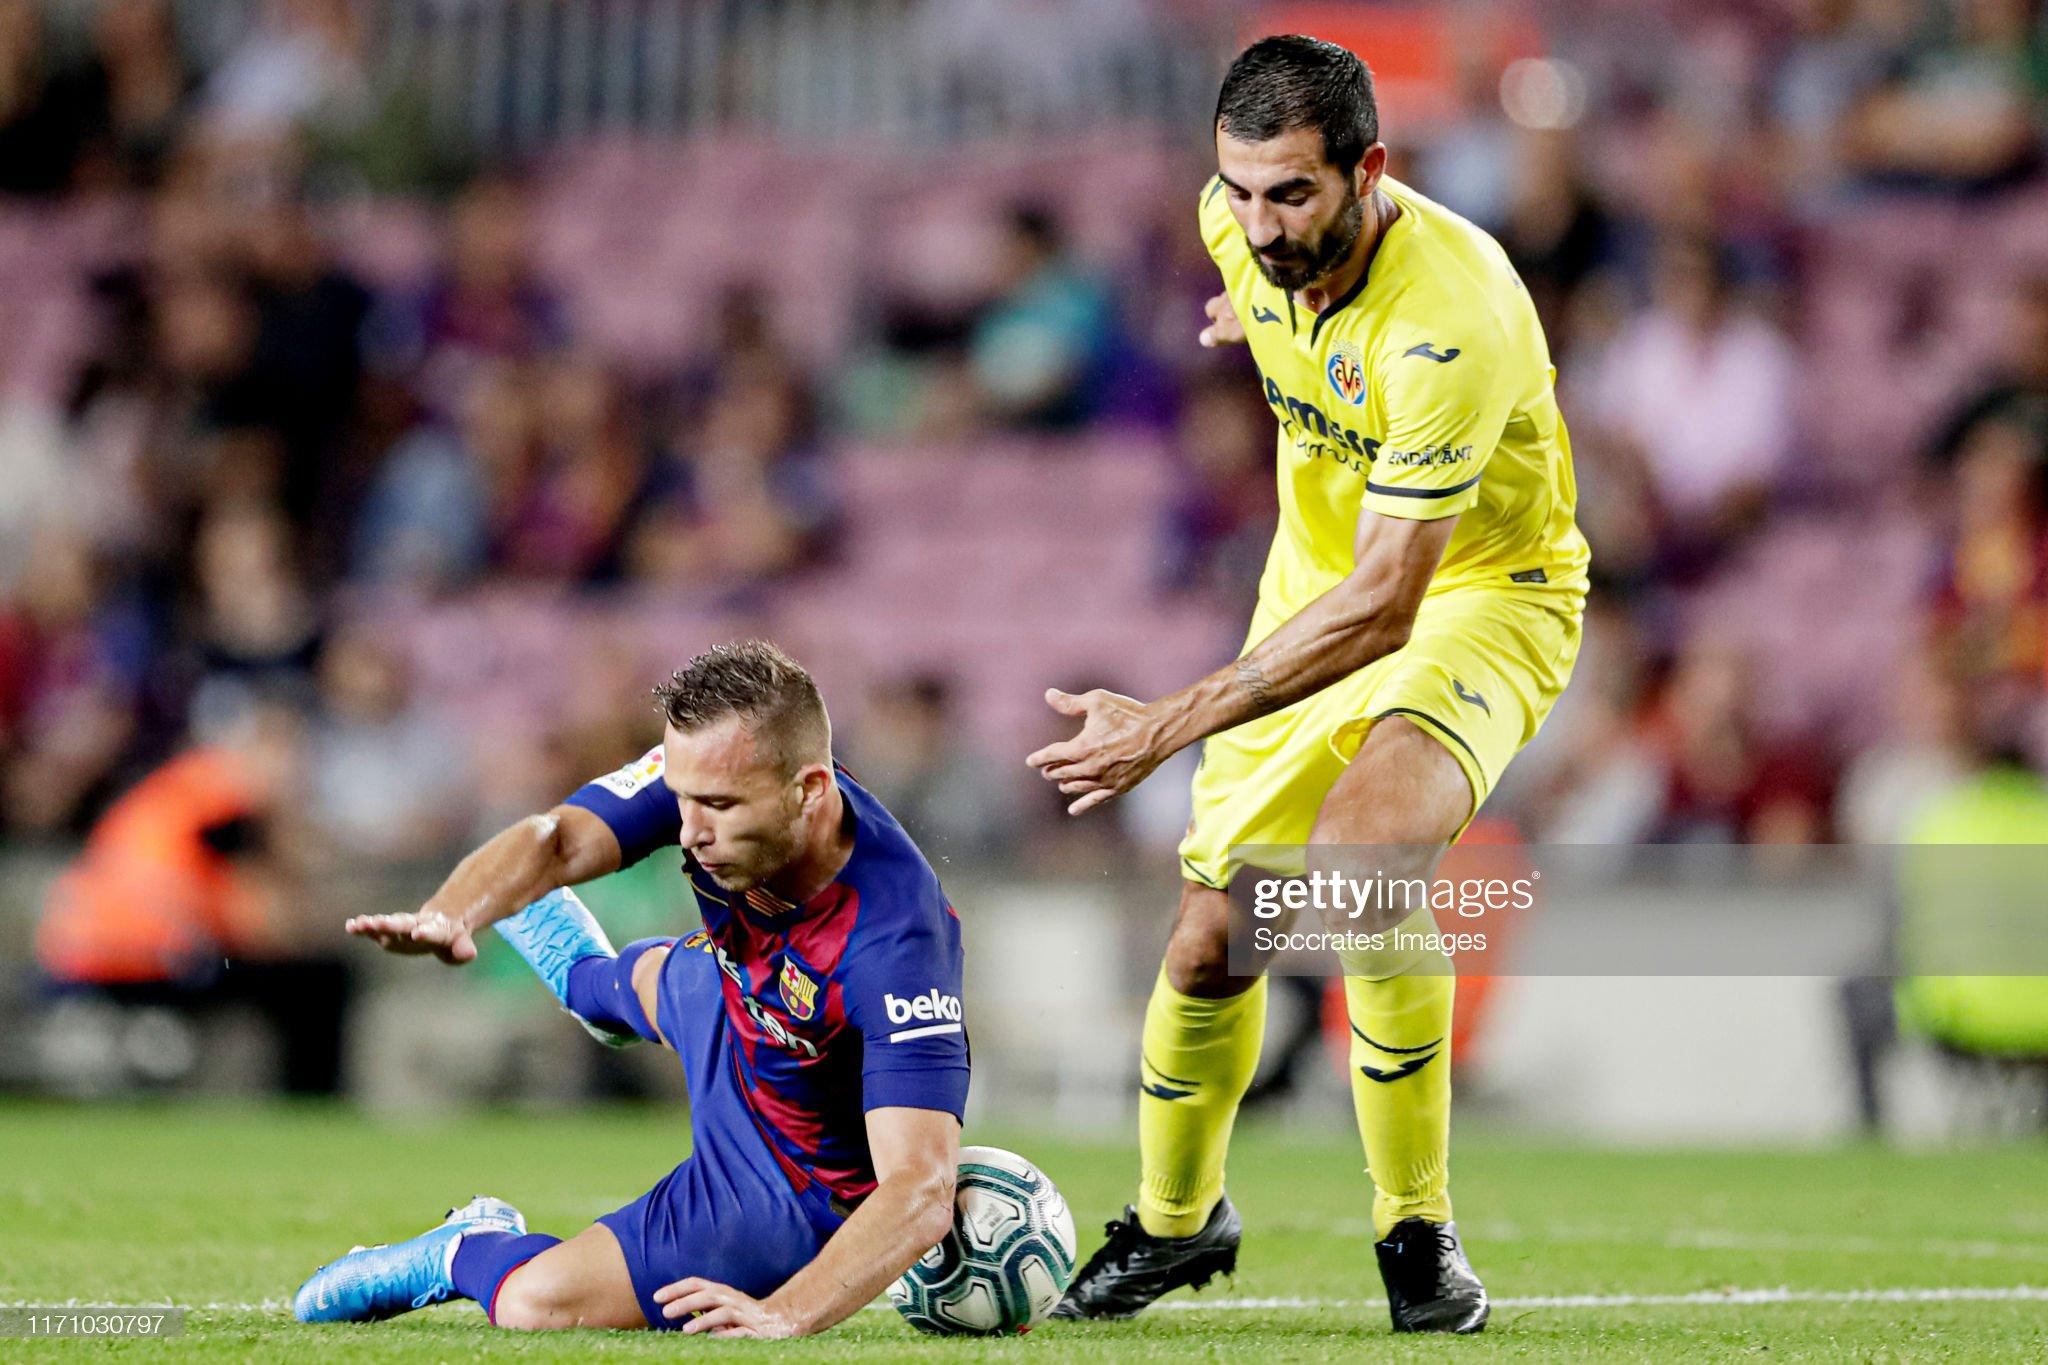 صور مباراة : برشلونة - فياريال 2-1 ( 24-09-2019 )  Arthur-of-fc-barcelona-raul-albiol-of-villarreal-during-the-la-liga-picture-id1171030797?s=2048x2048